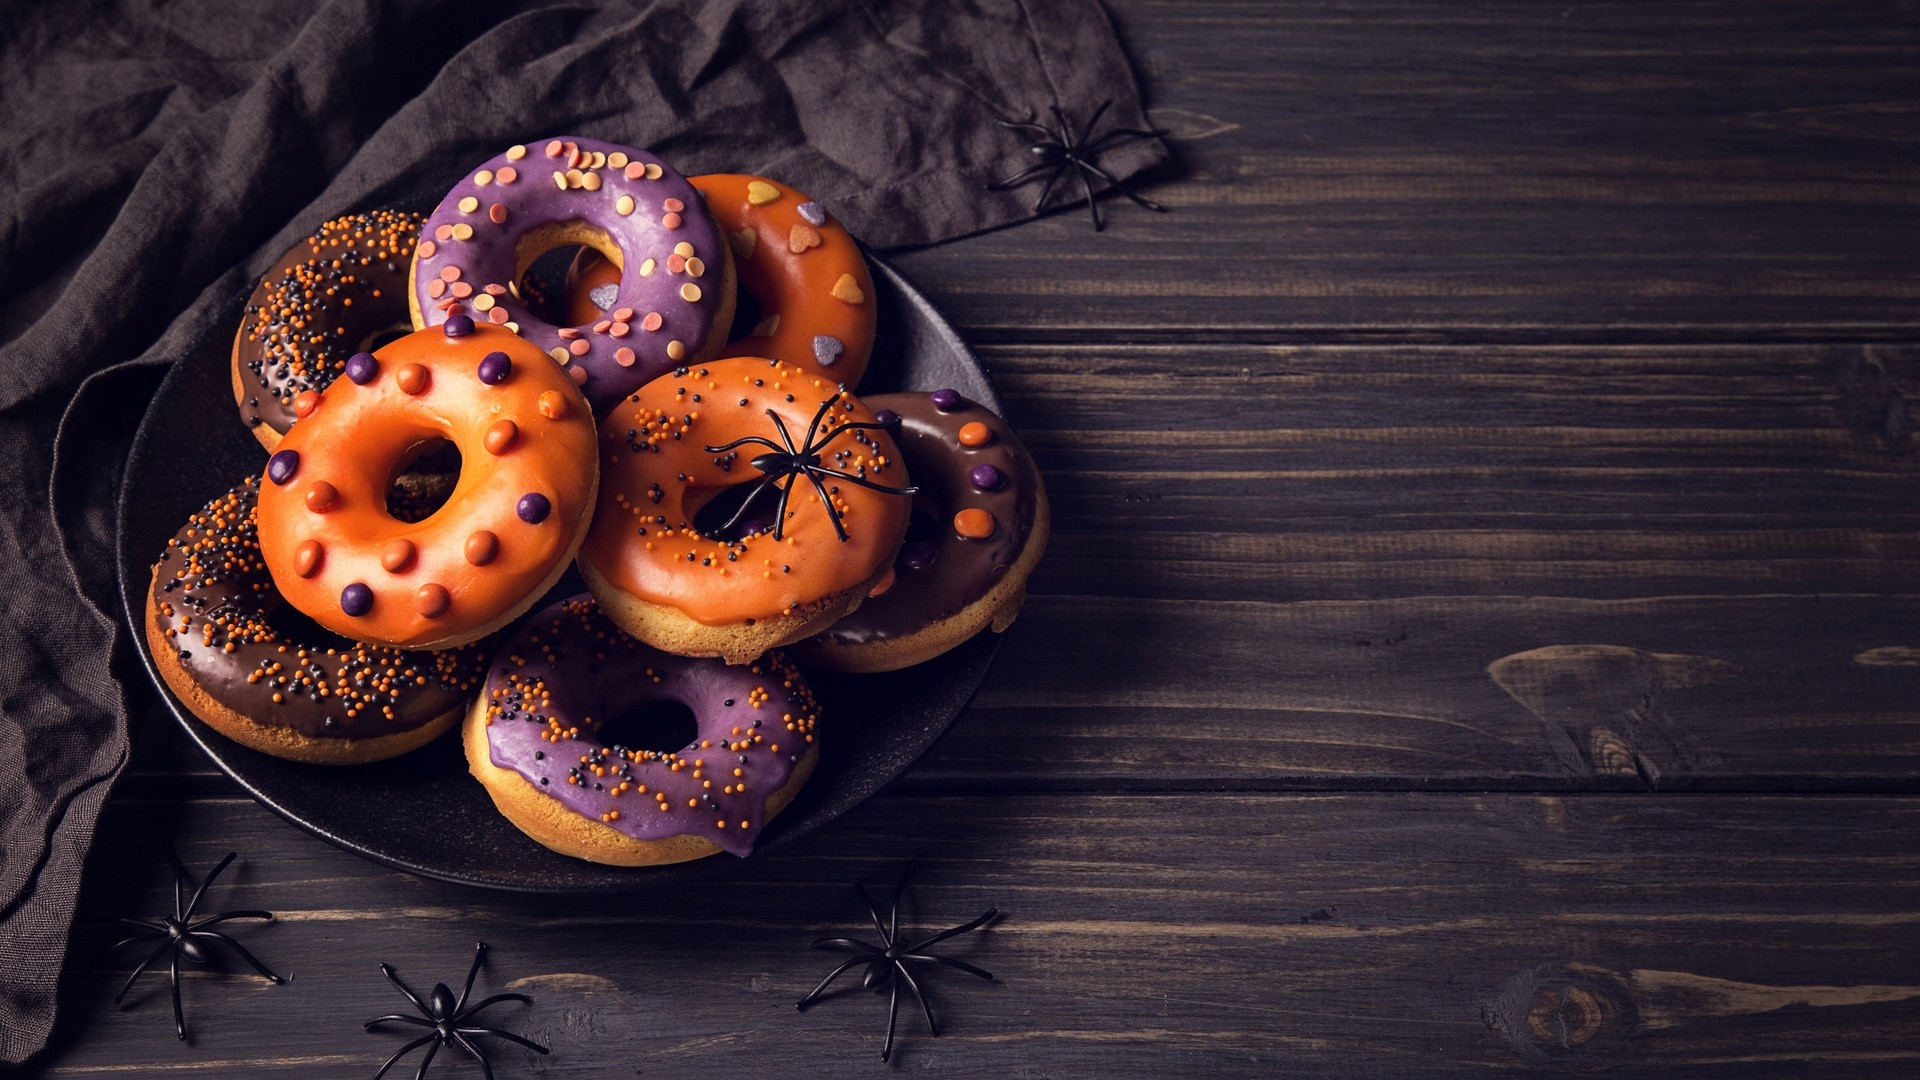 Donut Free Wallpaper